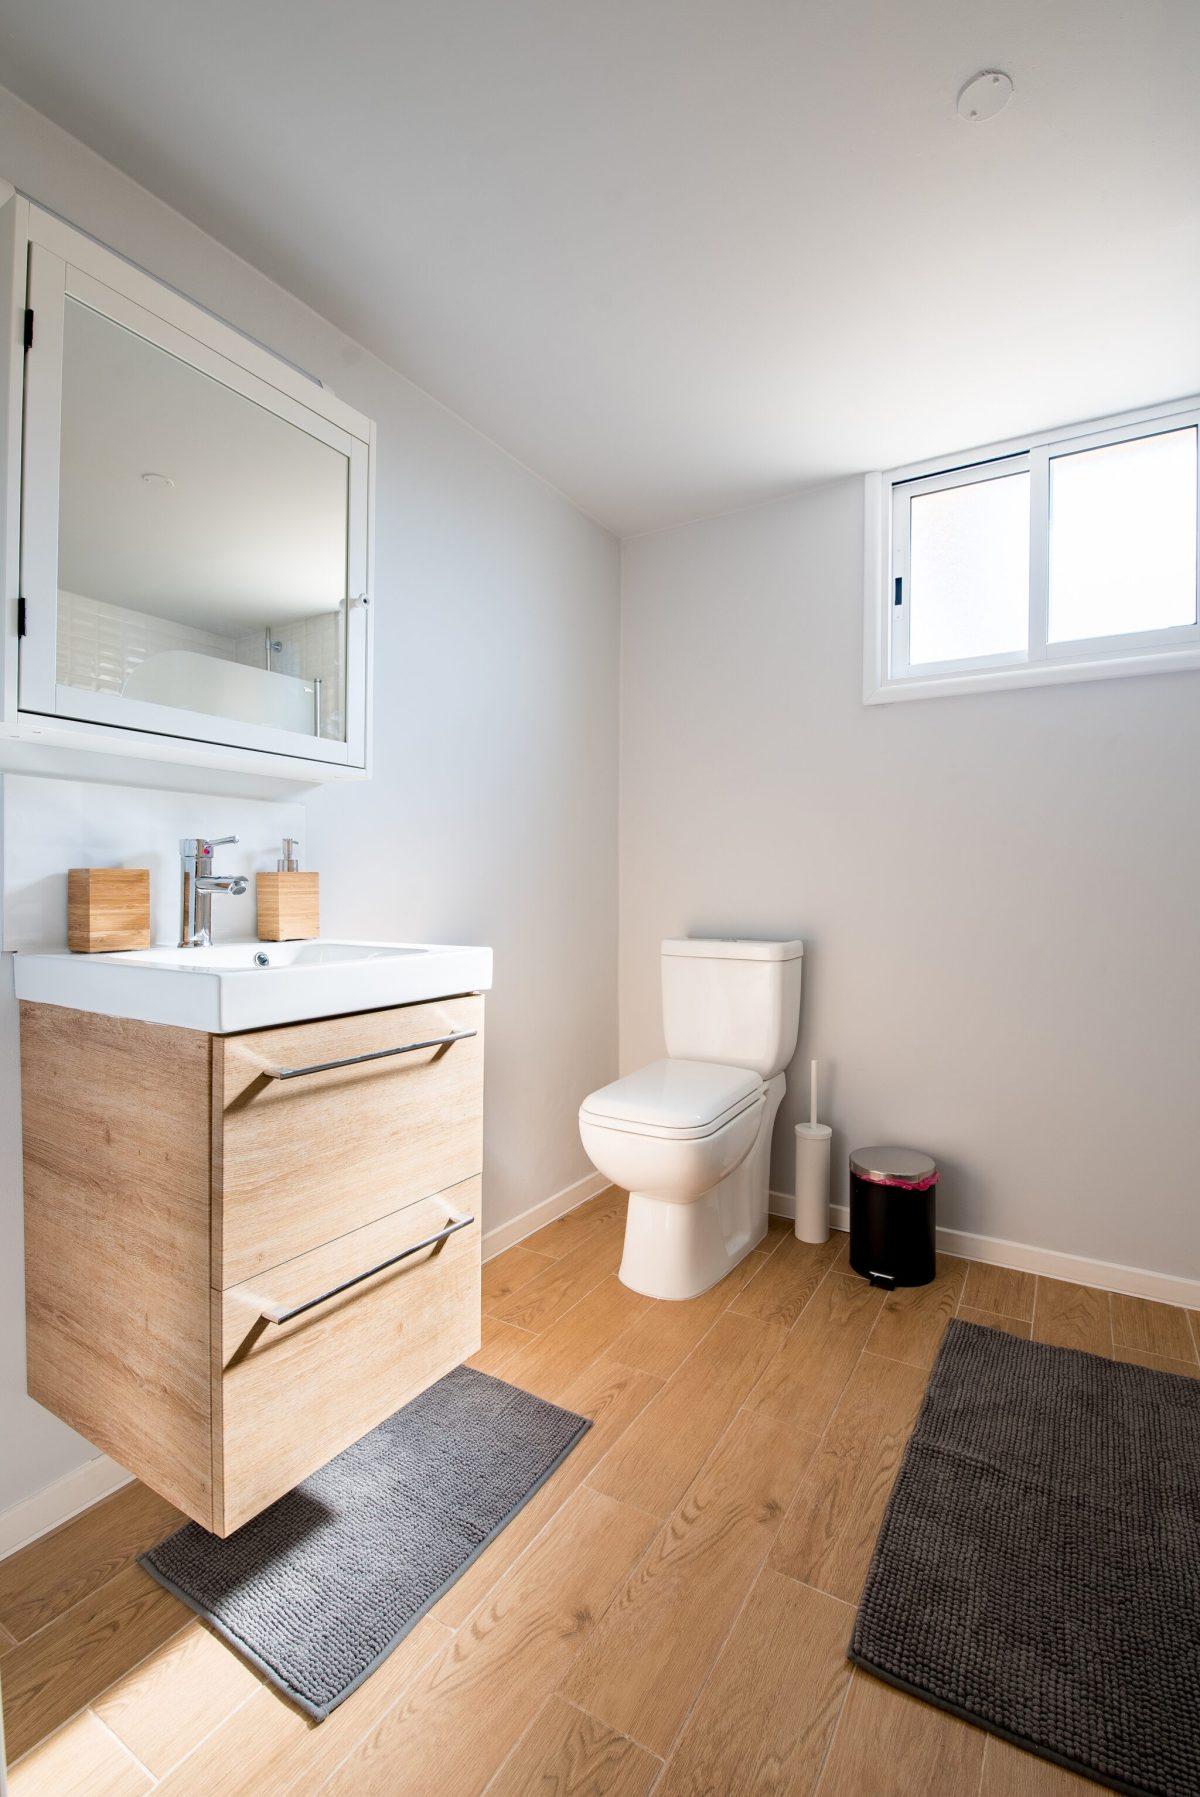 Design advice for shared bathrooms